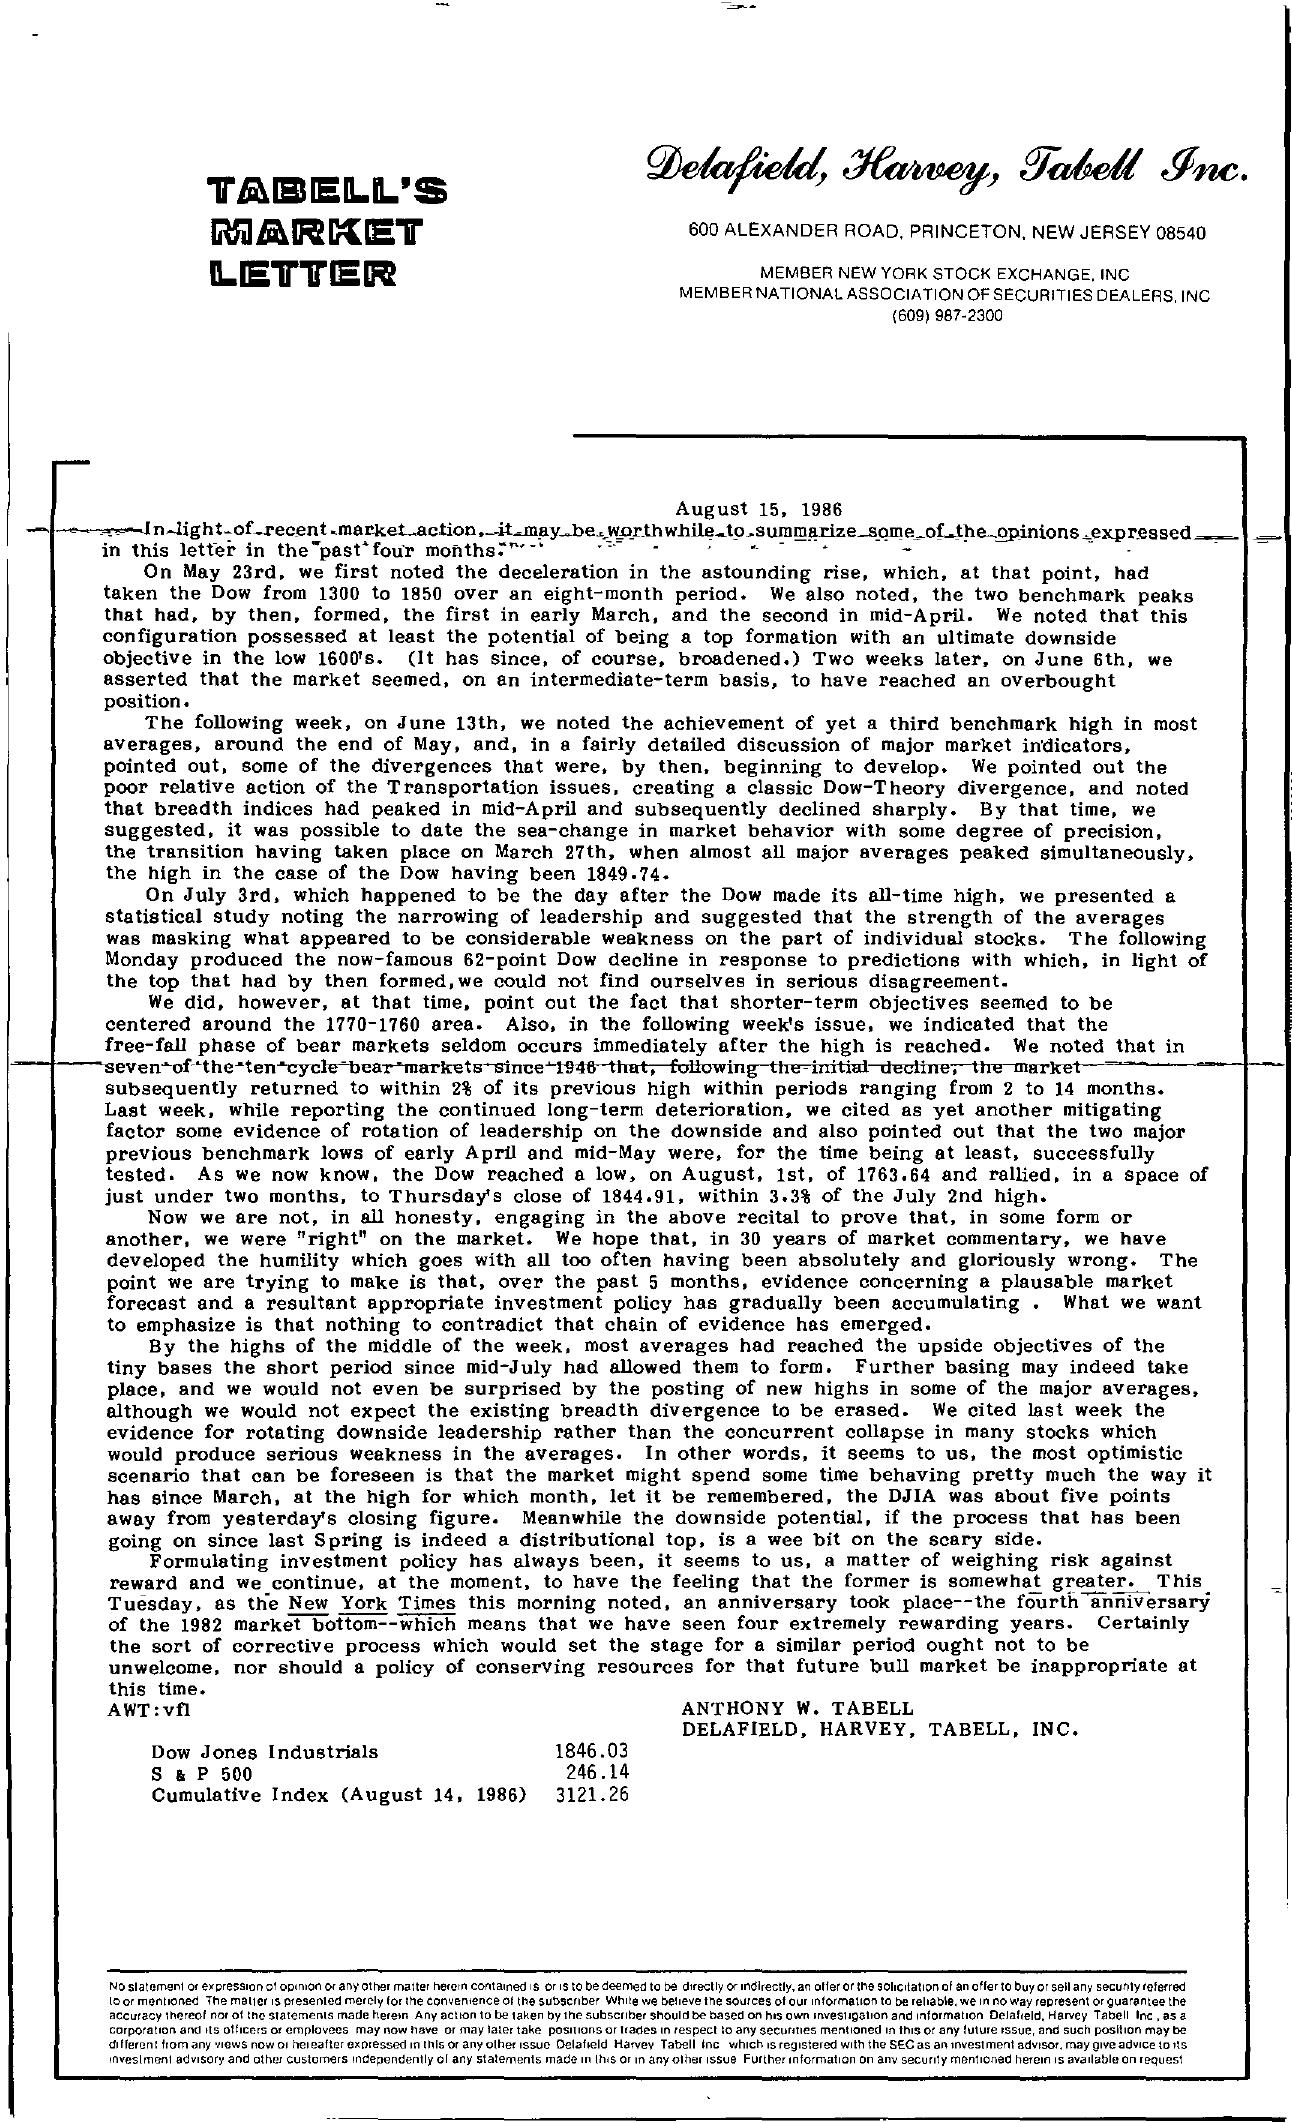 Tabell's Market Letter - August 15, 1986